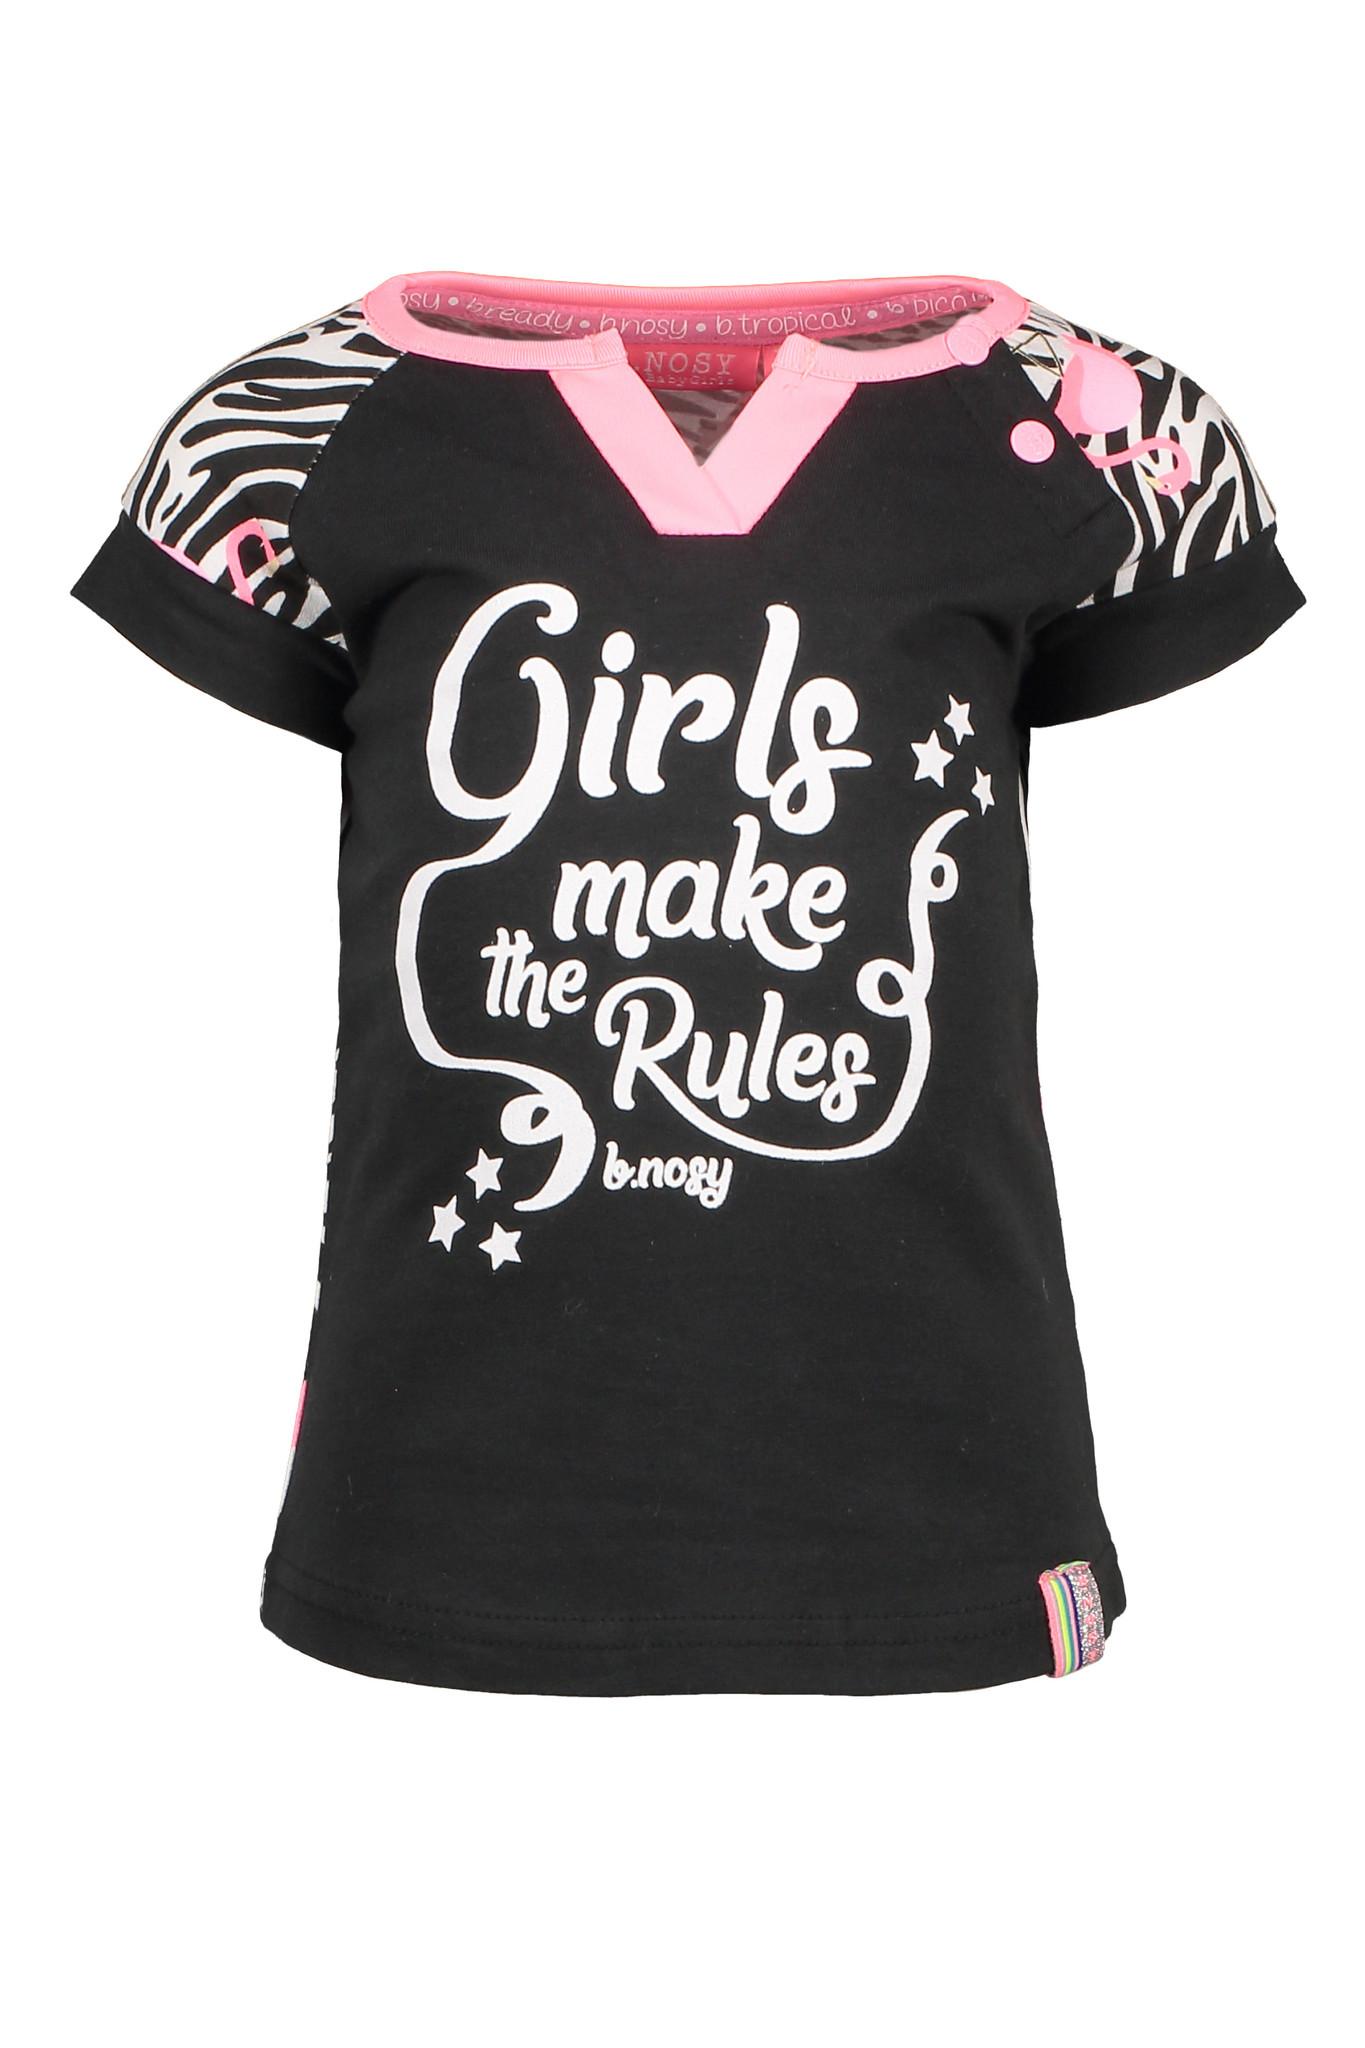 B.Nosy B.Nosy T-shirt with contrast print sleeves white flamingo zebra ao